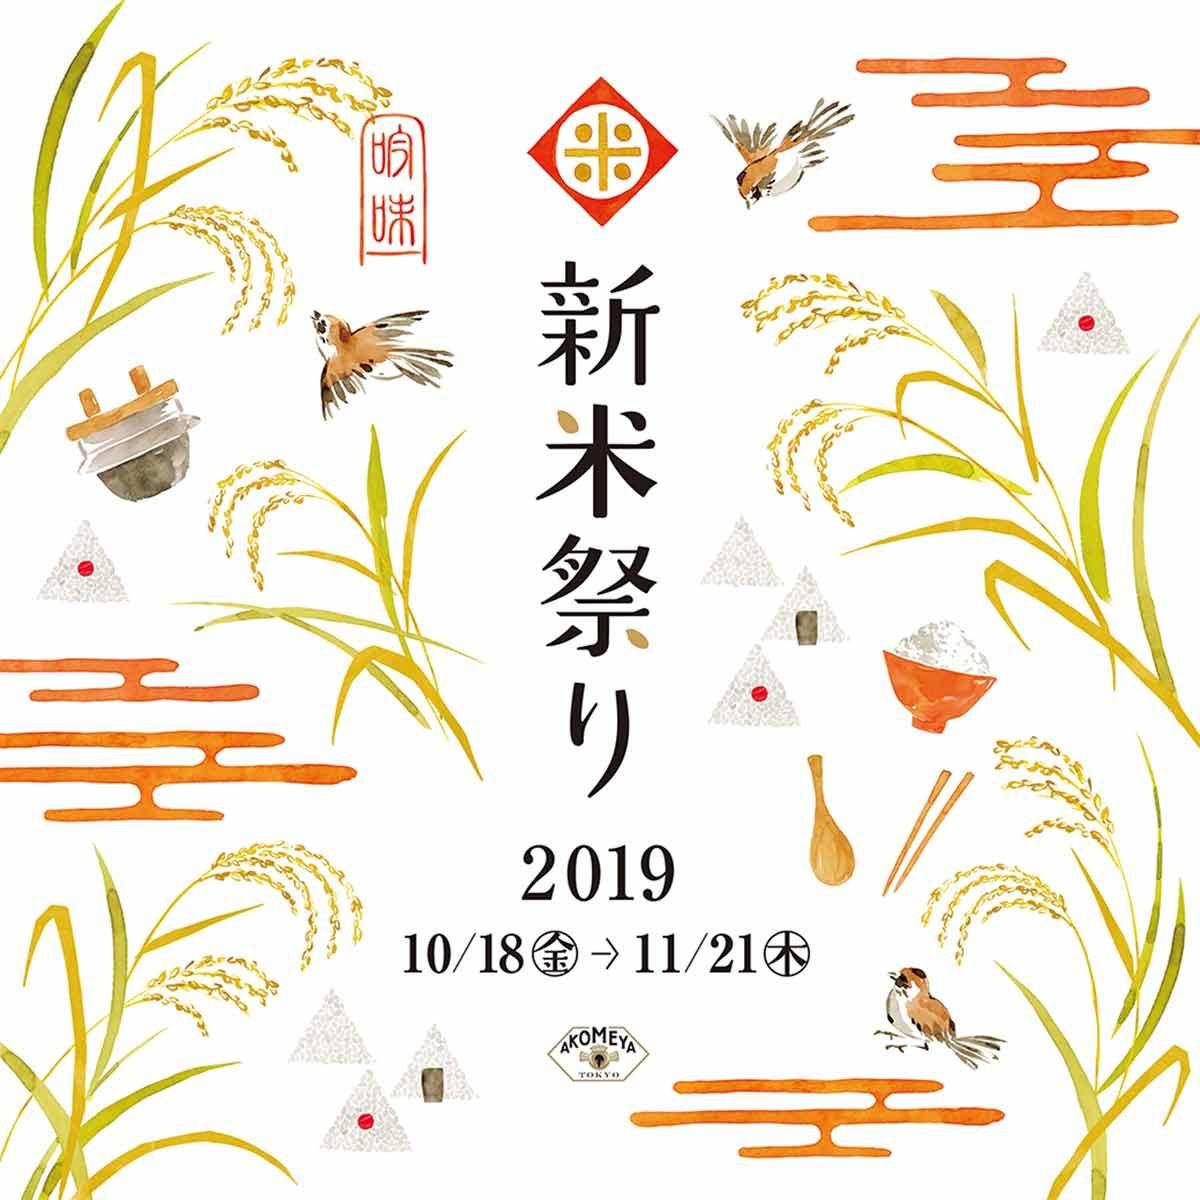 AKOMEYA TOKYO新米祭り